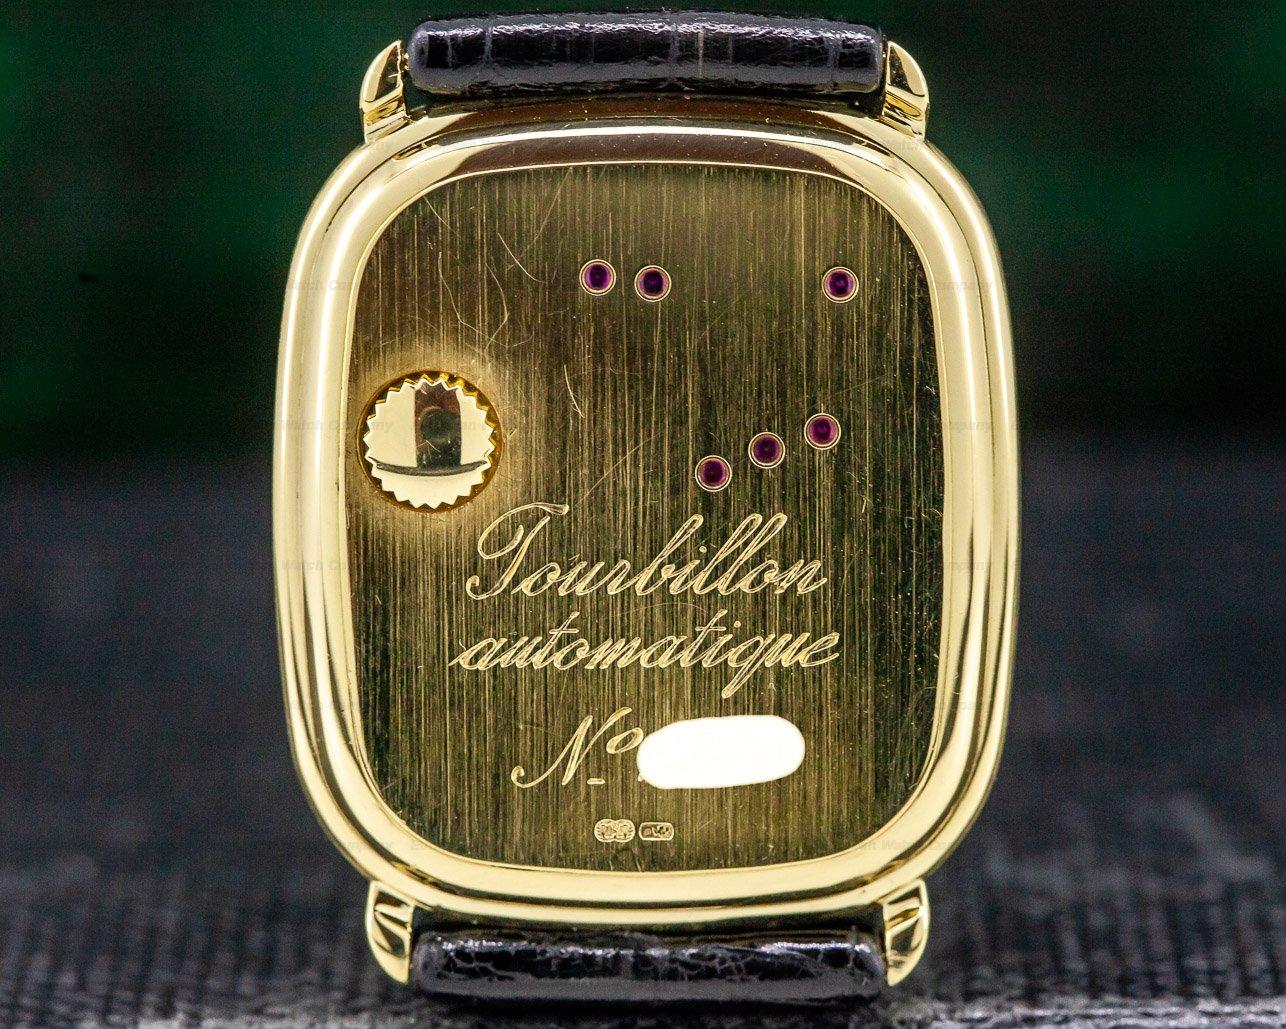 Audemars Piguet 25643BA/O/0003/01 Automatic Tourbillon Cushion Case 18K RARE & IMPORTANT